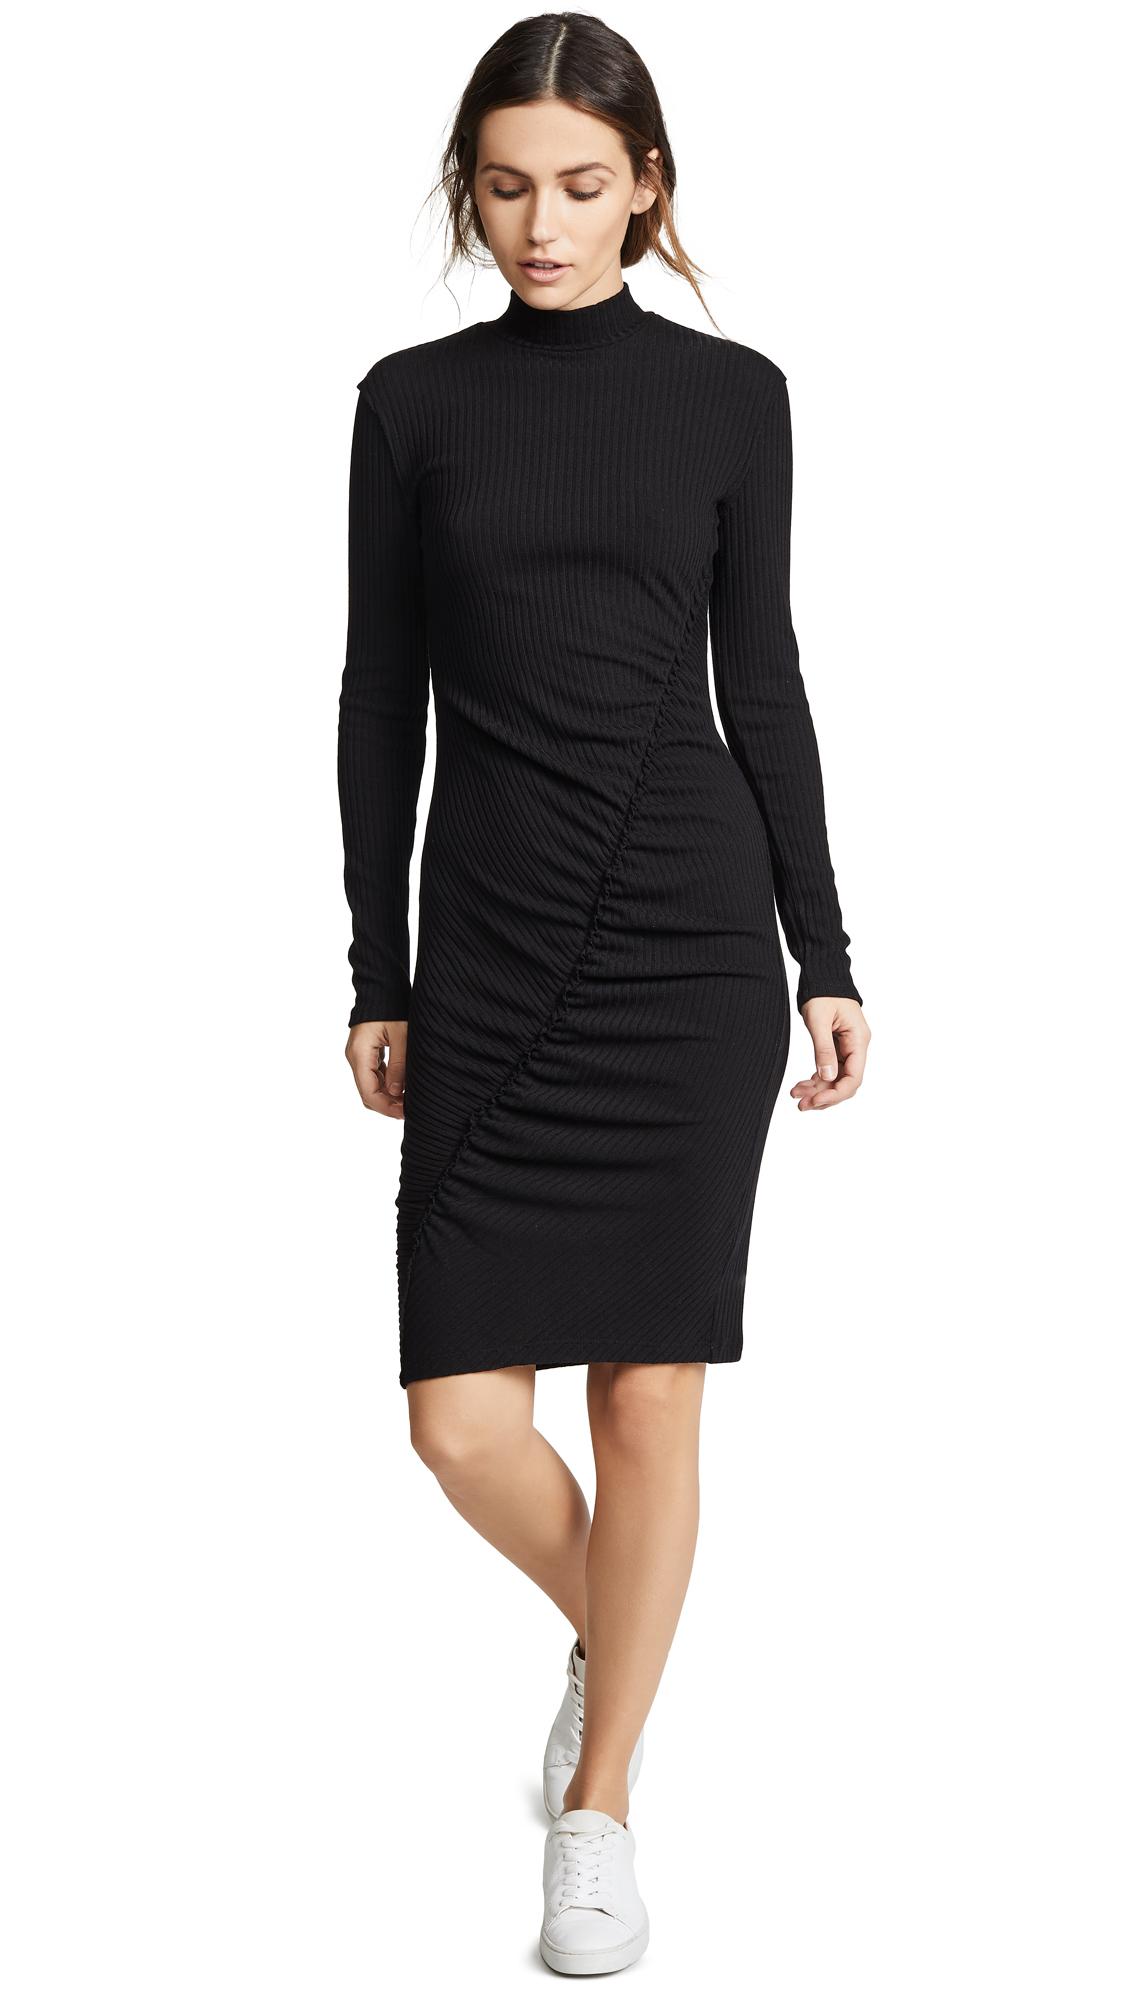 Splendid Sylvie Rib Knit Dress - Black